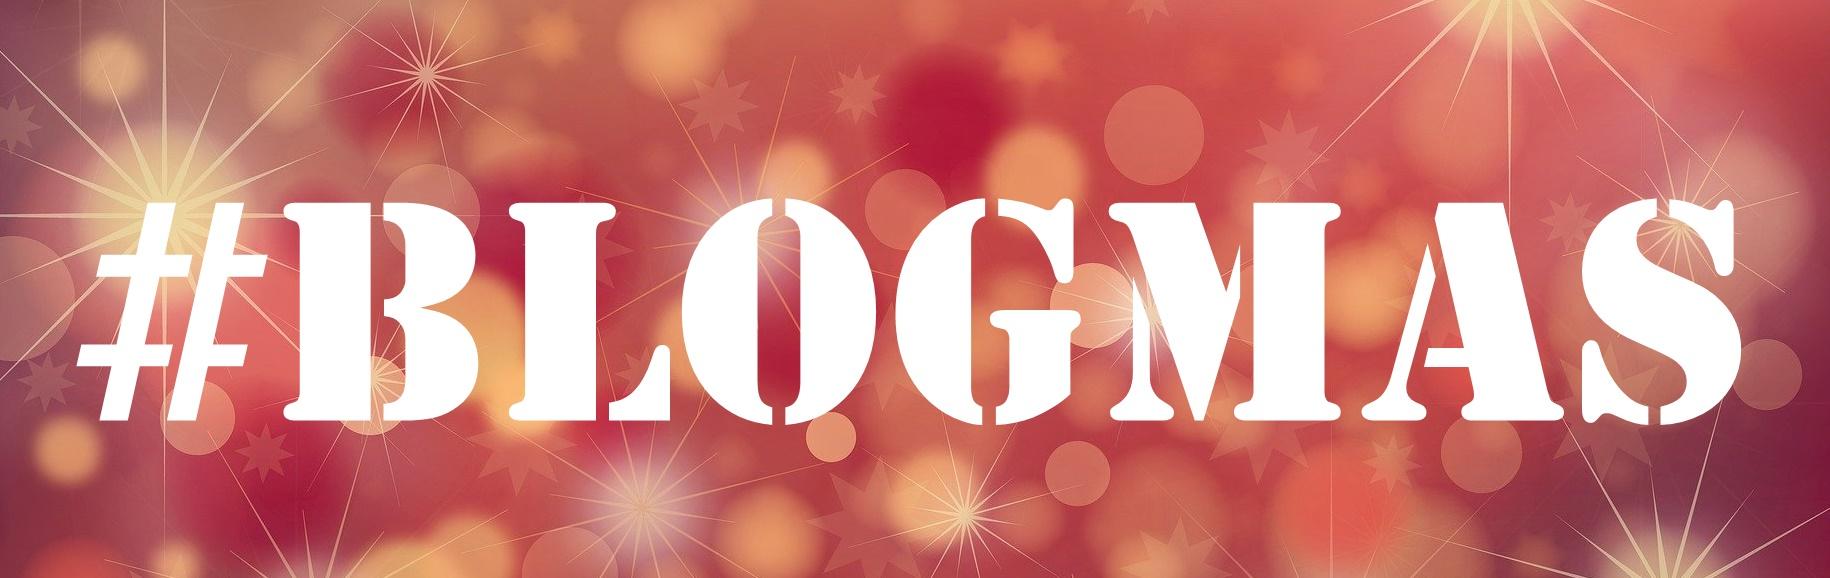 #BLOGMAS - www.makemyutopia.com